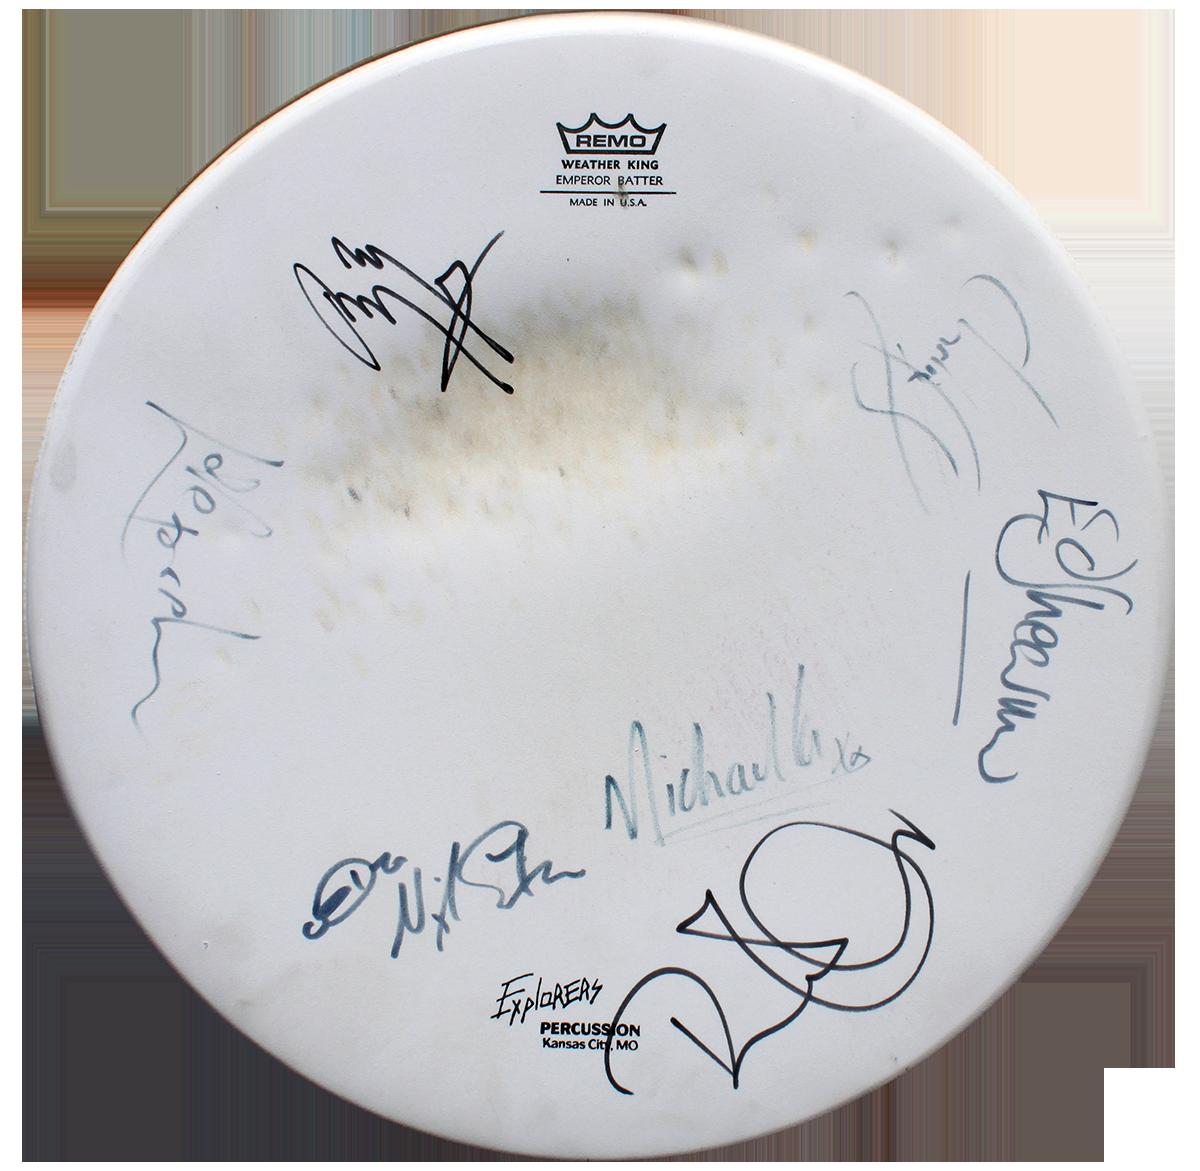 Led Zeppelin - Drumhead